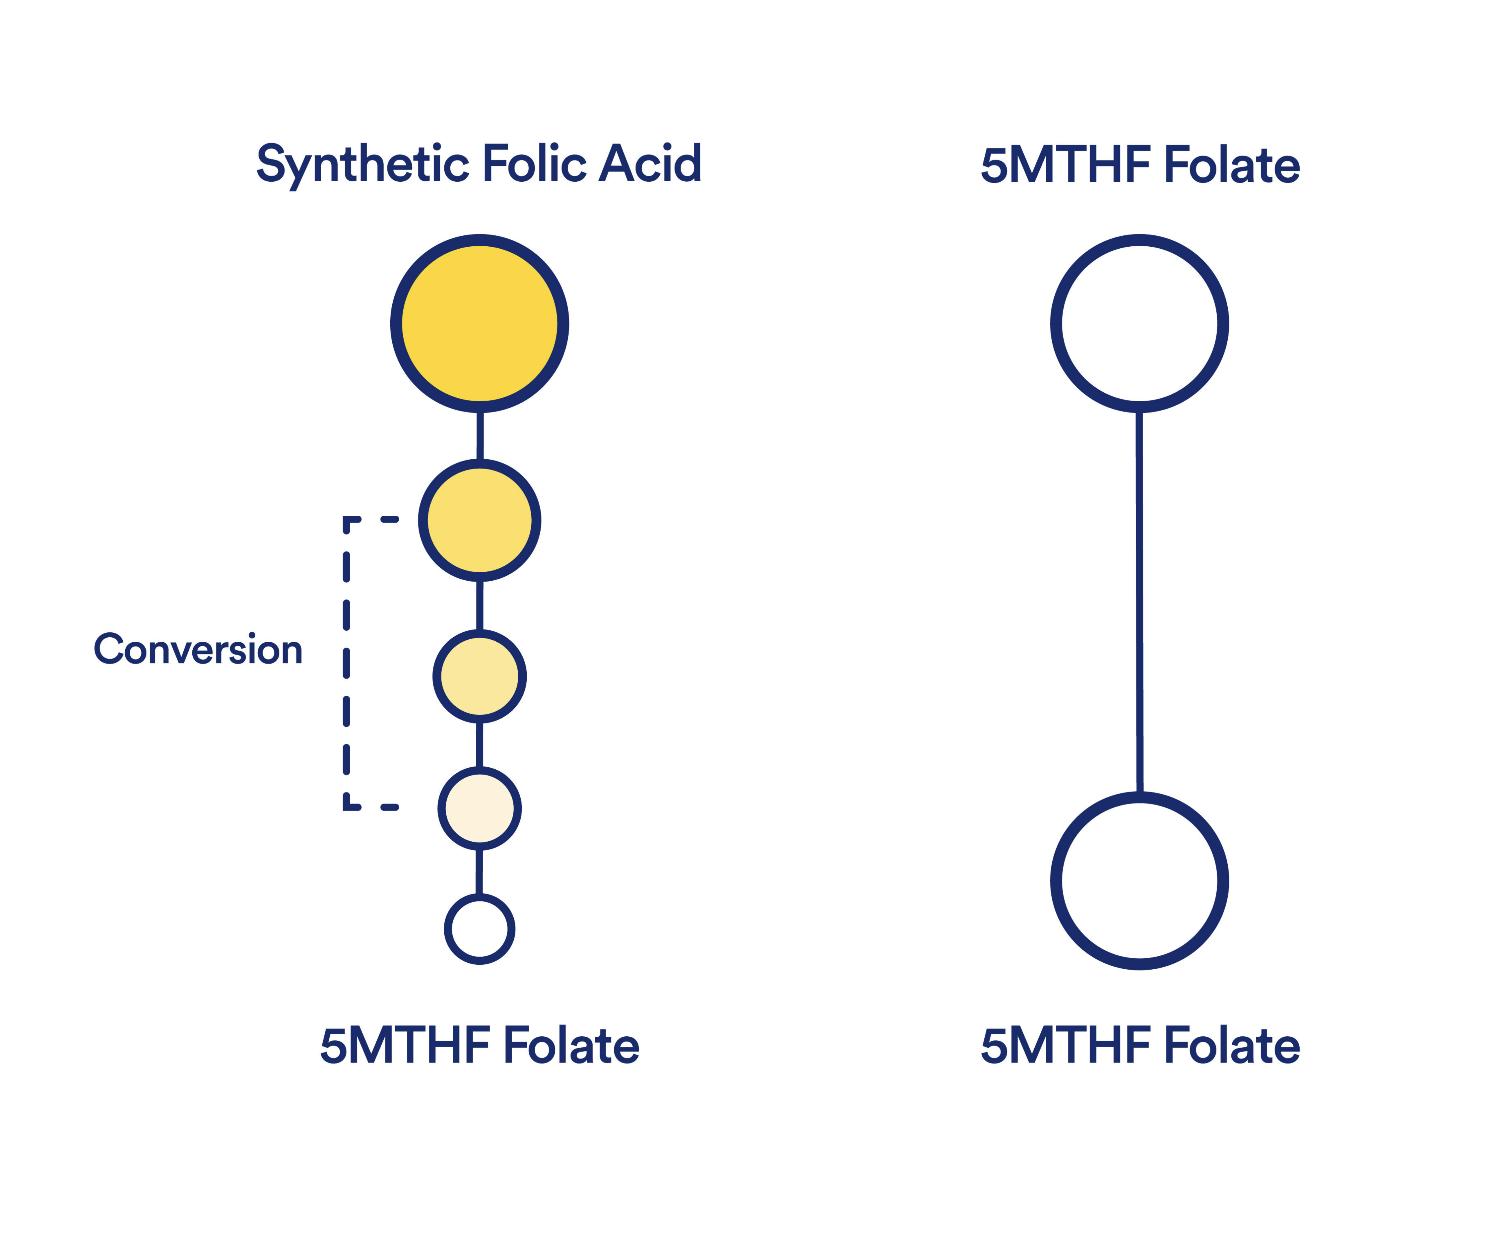 MTHF vs Folic Acid - Methylated Folate vs. Folic Acid